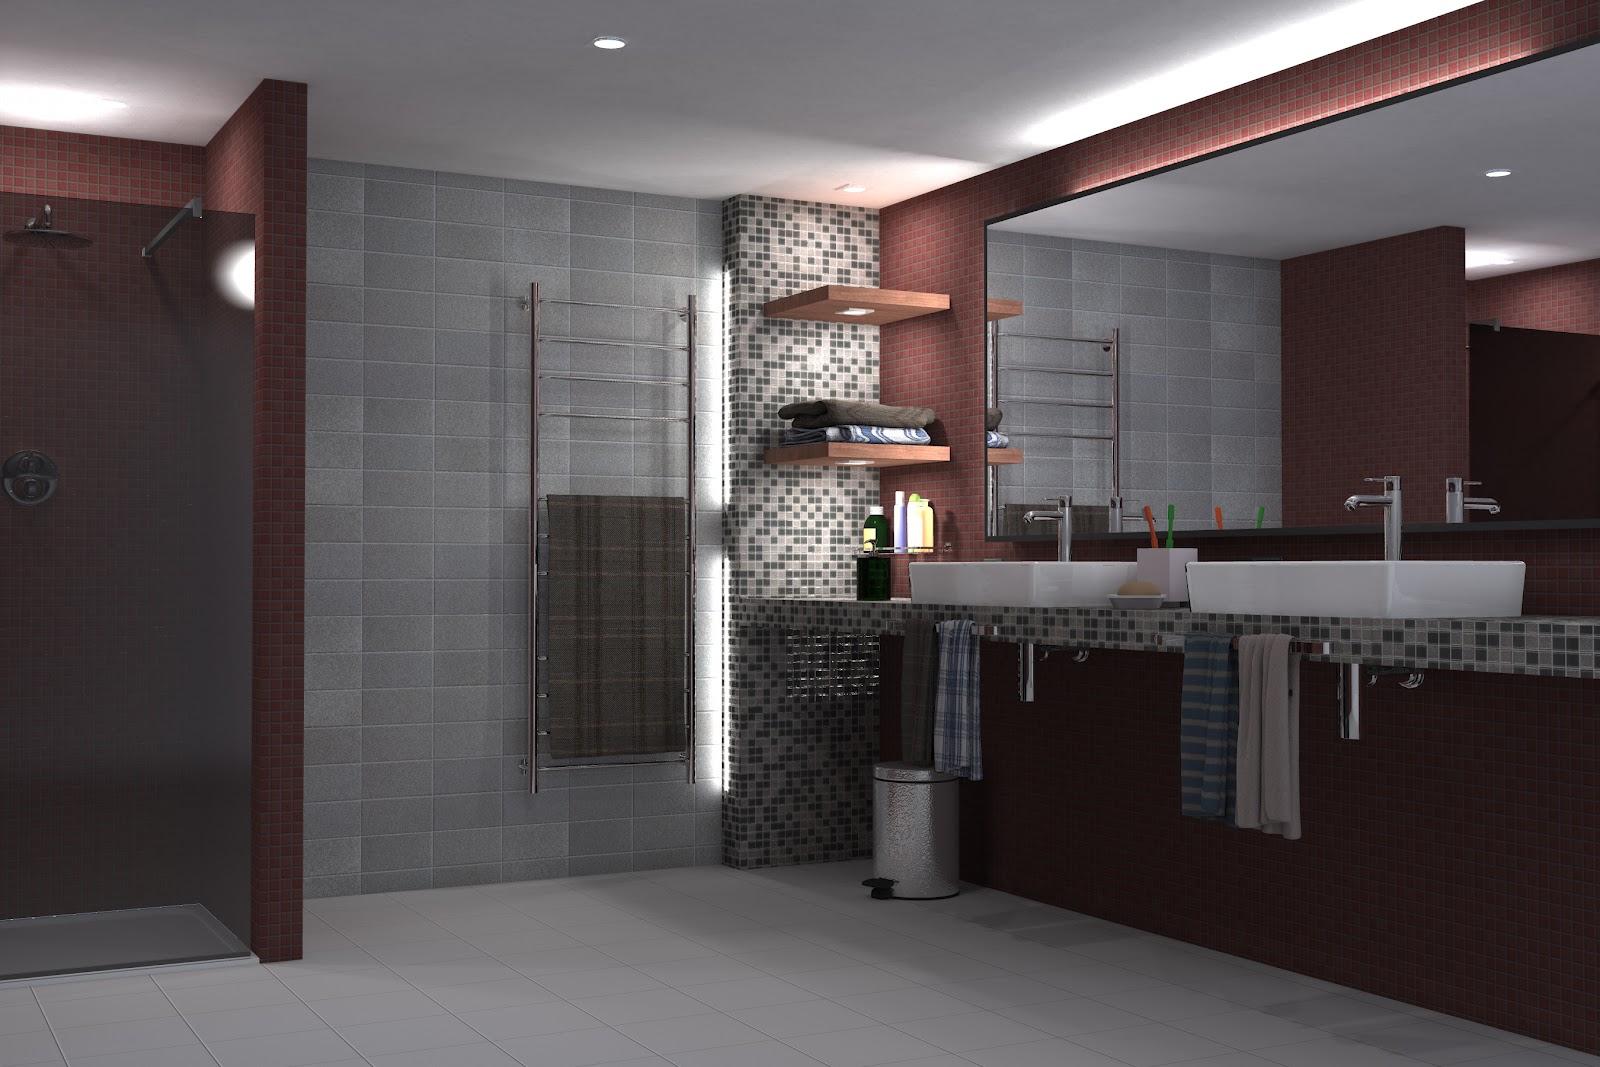 Render architettonici interno bagno for Planner bagno 3d